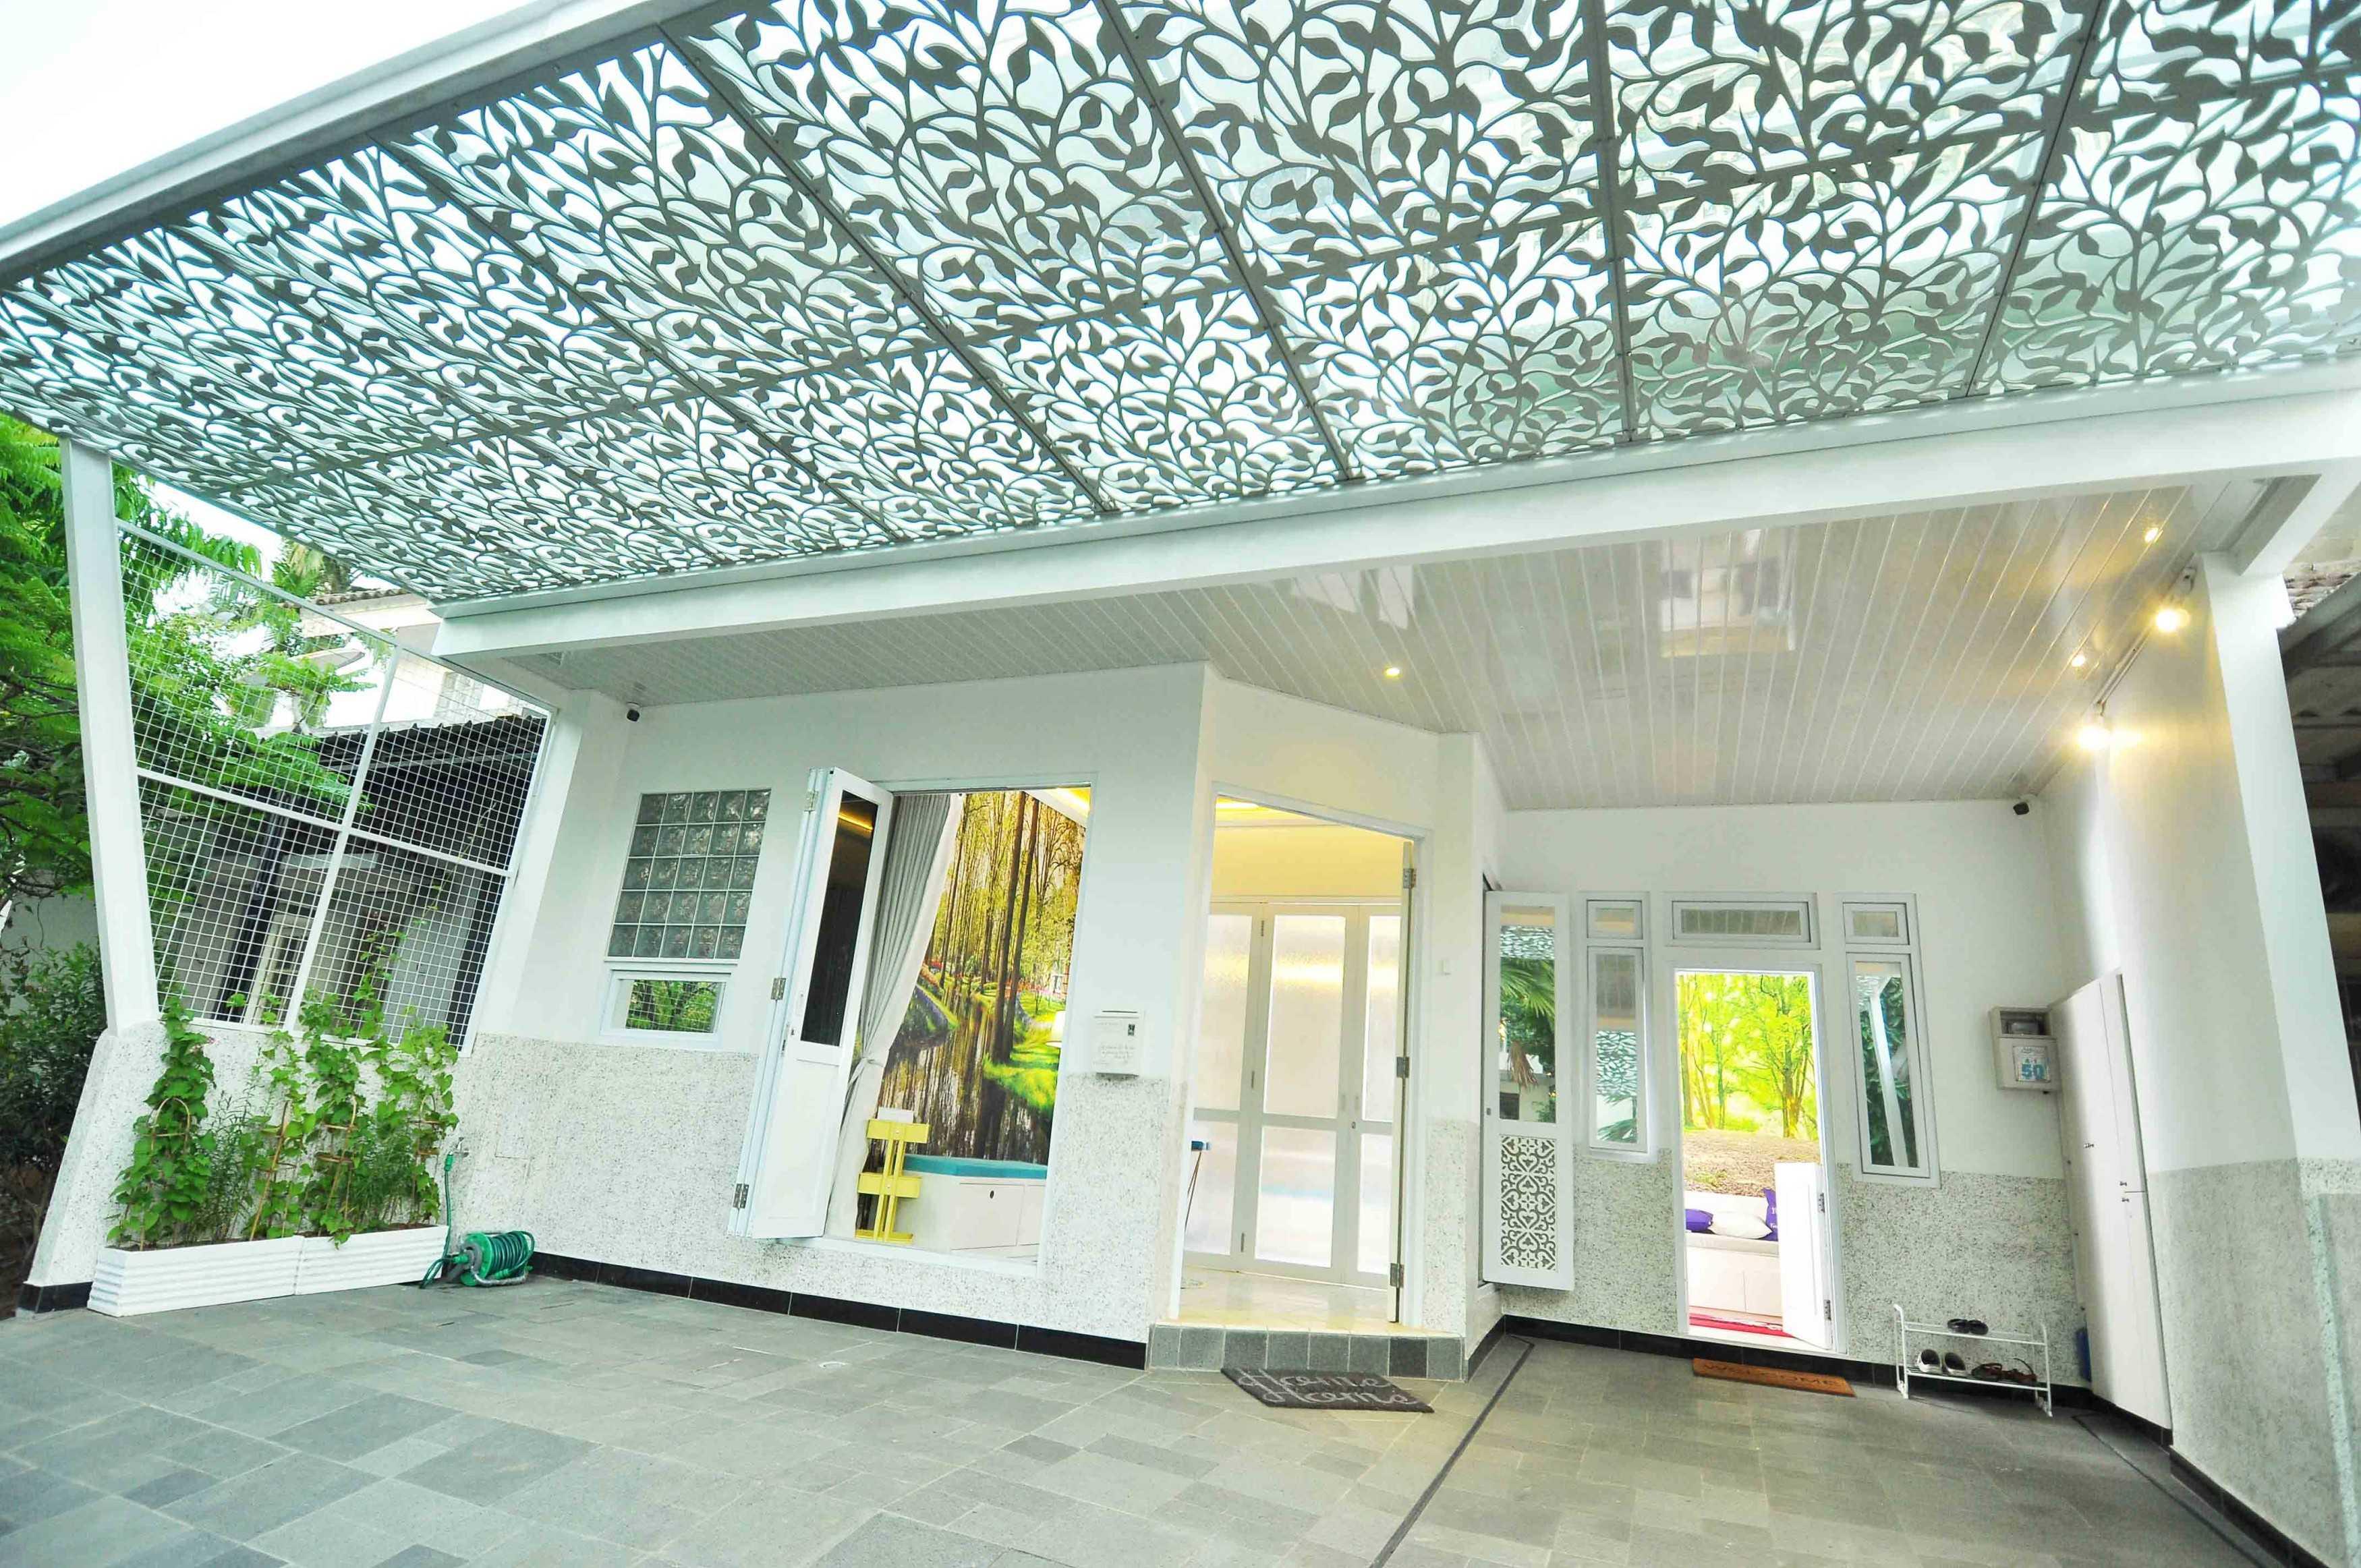 Arsigram Architecture Art Deco Style Jln Alteri Bintaro No.78 Rt 007/001, Bintaro Jaya, Kec. Pd. Aren, Kota Tangerang Selatan, Banten, Indonesia Jln Alteri Bintaro No.78 Rt 007/001, Bintaro Jaya, Kec. Pd. Aren, Kota Tangerang Selatan, Banten, Indonesia Arsigram-Architecture-Art-Deco-Style   82746